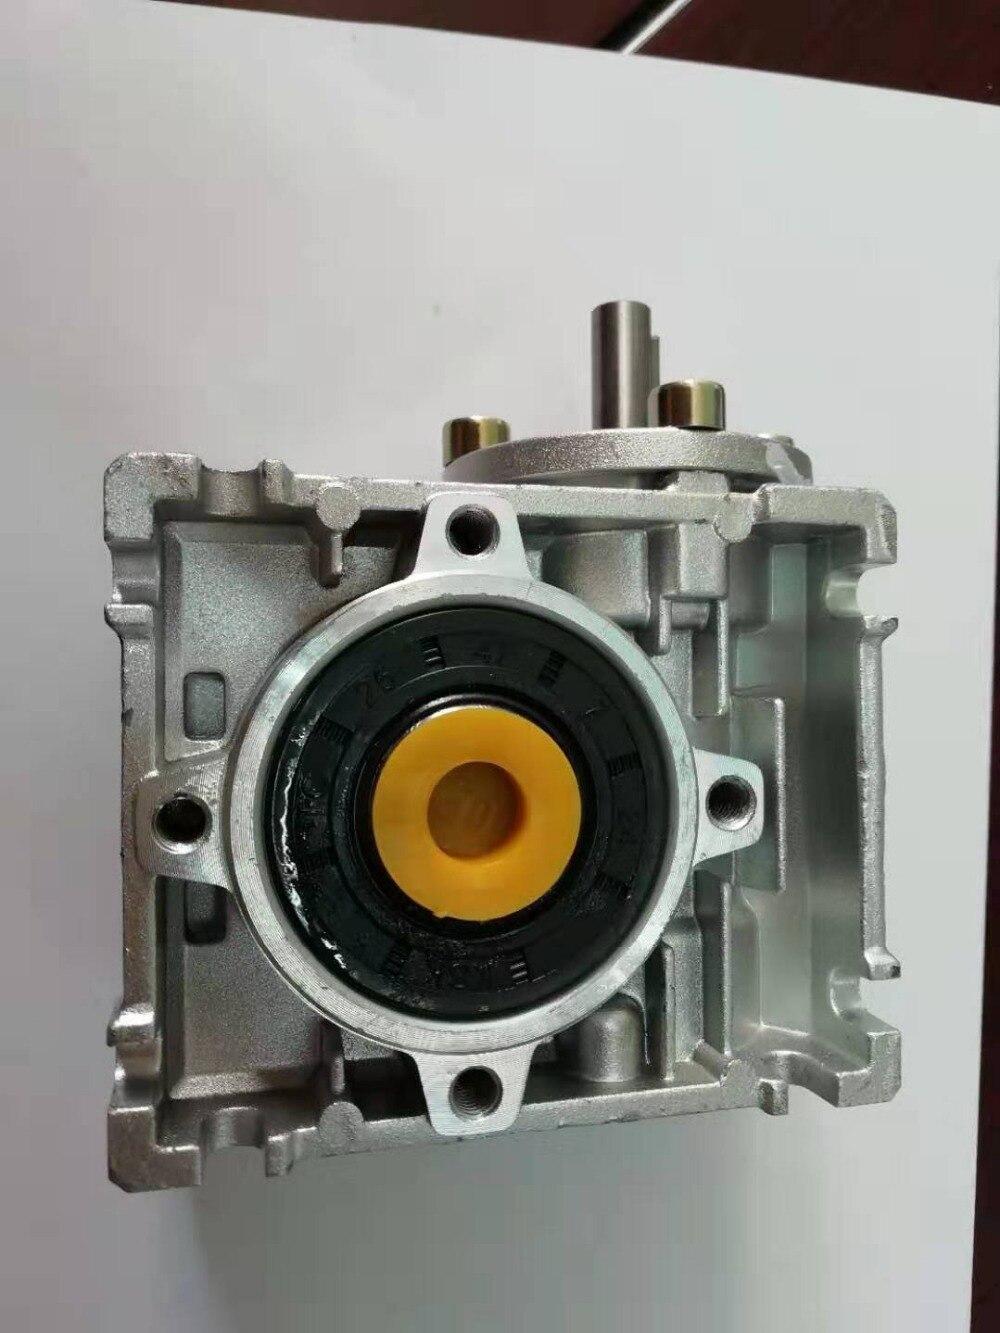 5:1-100:1 NRV40 shaft input worm gear reducer, input hole 11mm output hole 18mm or 19mm, hand crank turbine reducer5:1-100:1 NRV40 shaft input worm gear reducer, input hole 11mm output hole 18mm or 19mm, hand crank turbine reducer